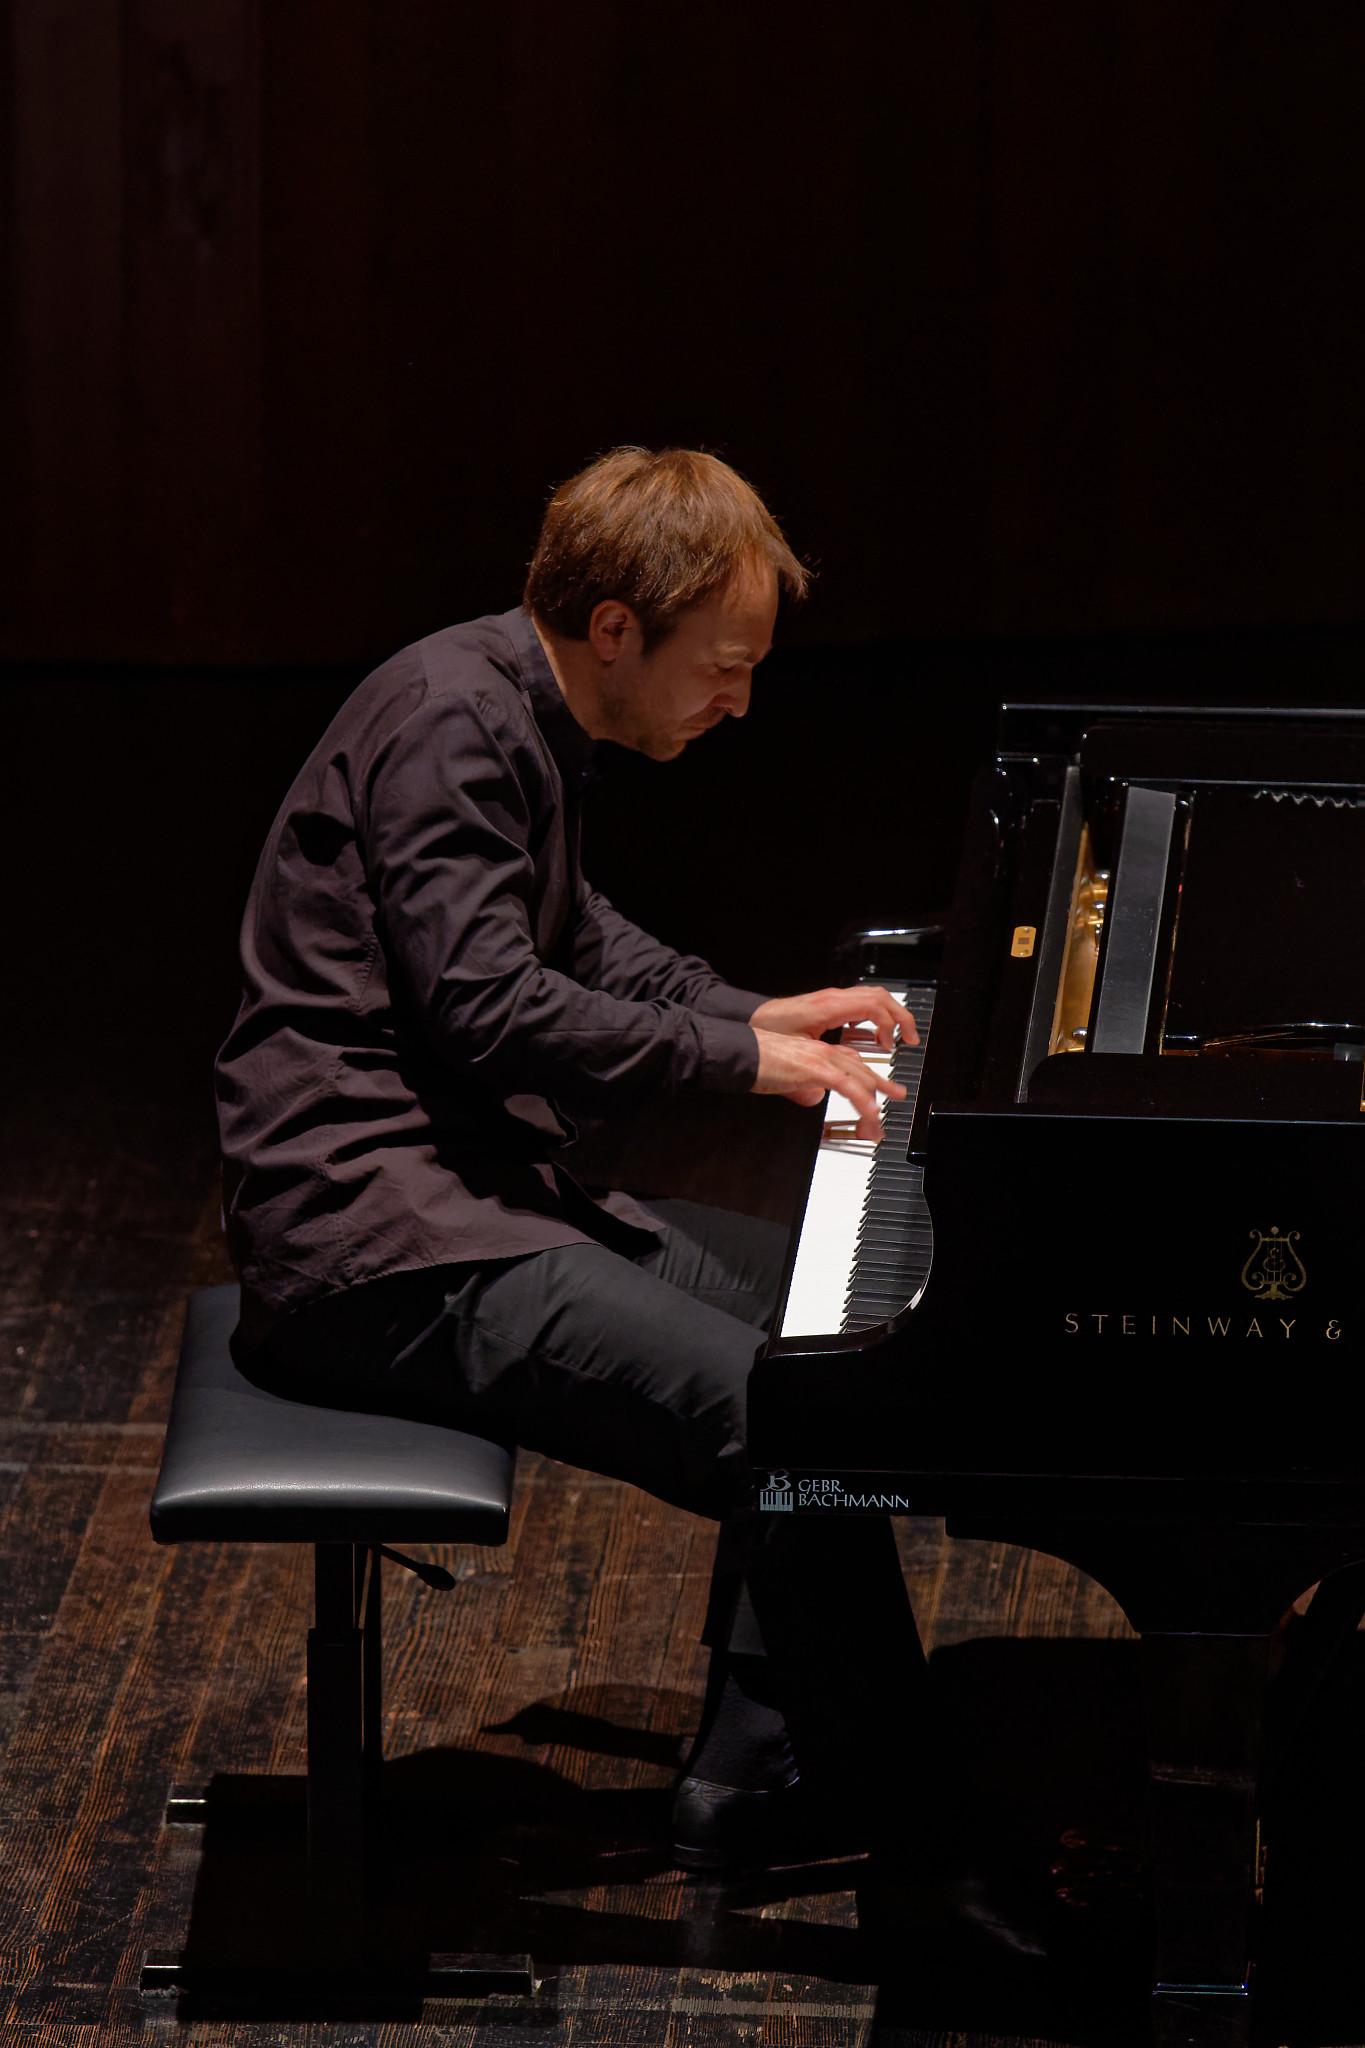 Herbert Schuch @ Klavierissimo Festival, Wetzikon ZH, 2020-01-31 (© Rolf Kyburz)